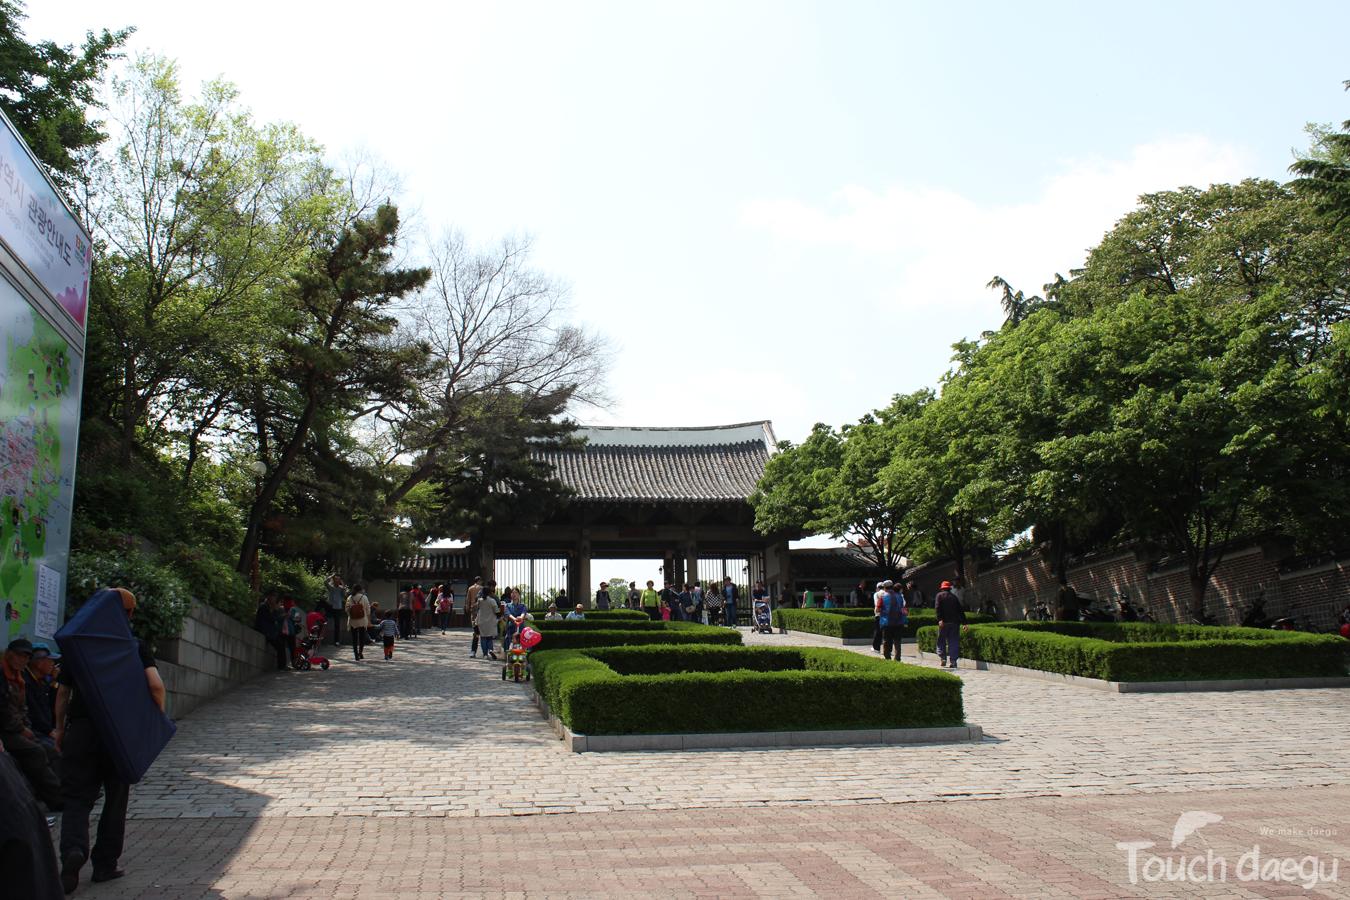 Dalseong park, Daegu stamp trail